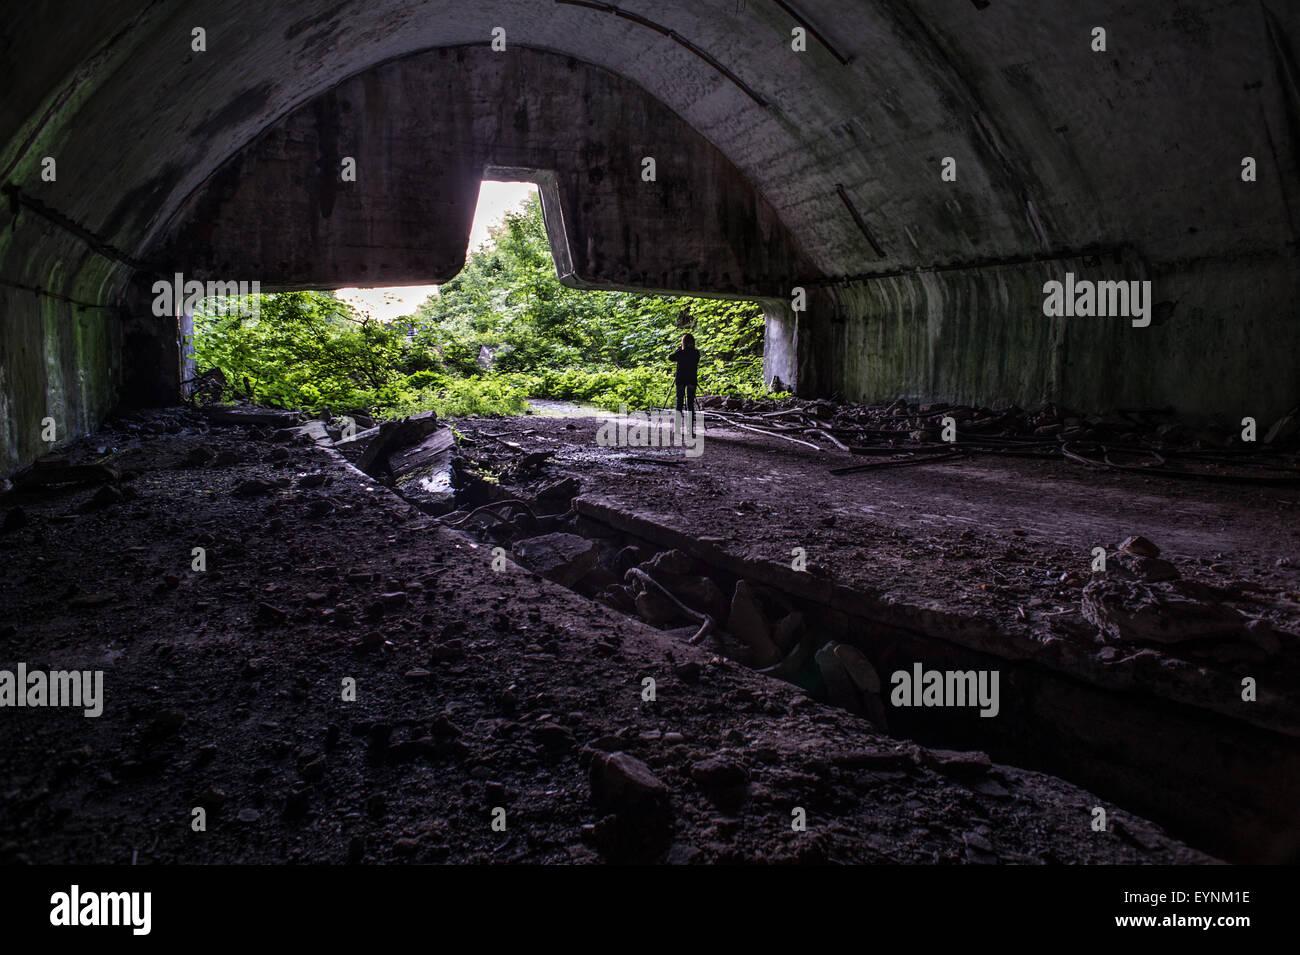 Hangar tunnel in the old jugoslavian anti atomic base of Zeljava, on the border Croazia, Bosnia and Erzegovina - Stock Image